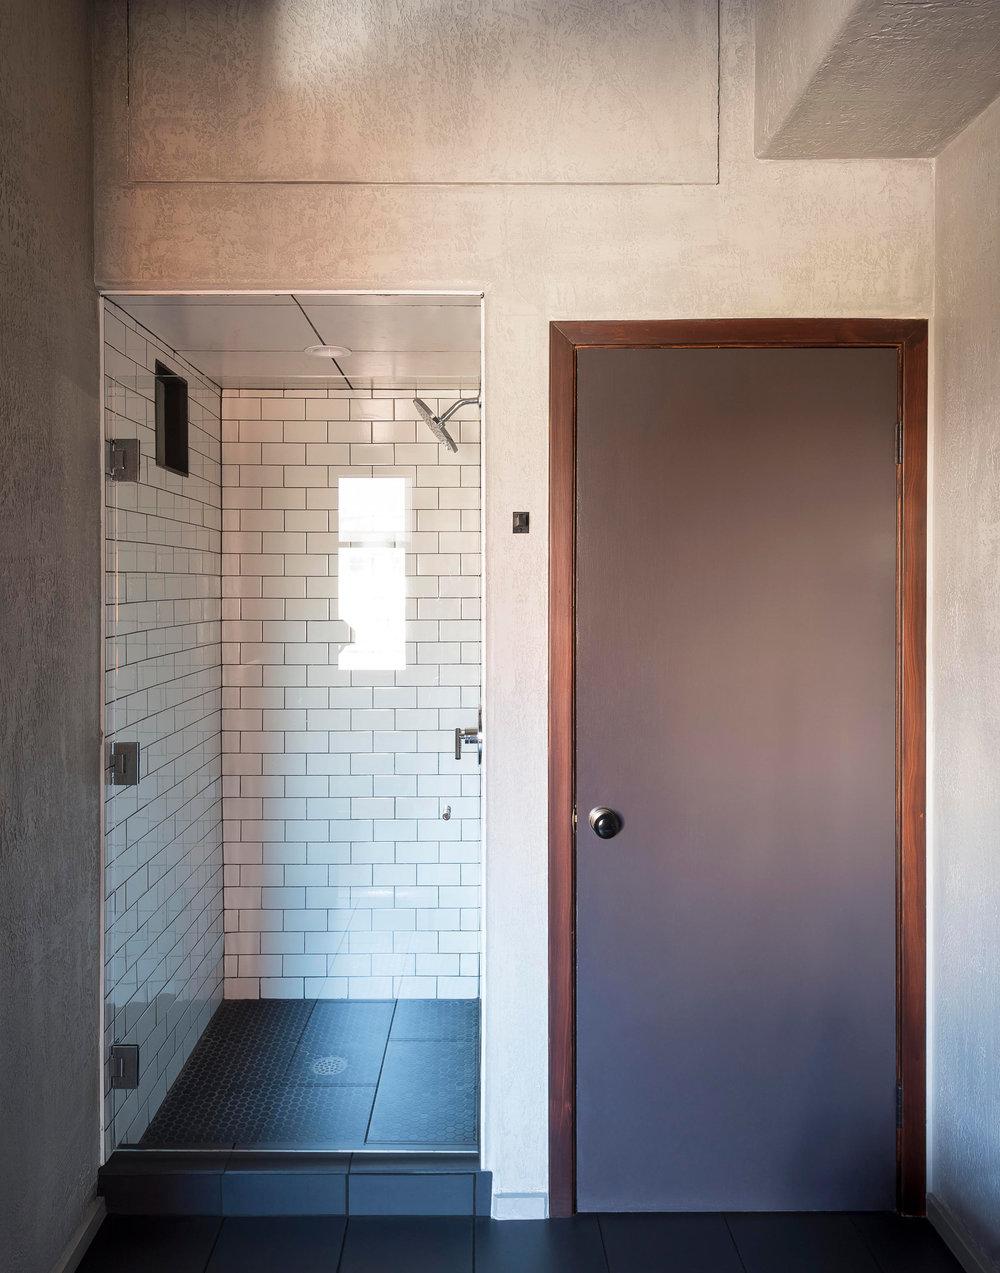 Wm.-Mulherin_s-Sons-Hotel---Bathroom-shower---by-Matthew-Williams.jpg